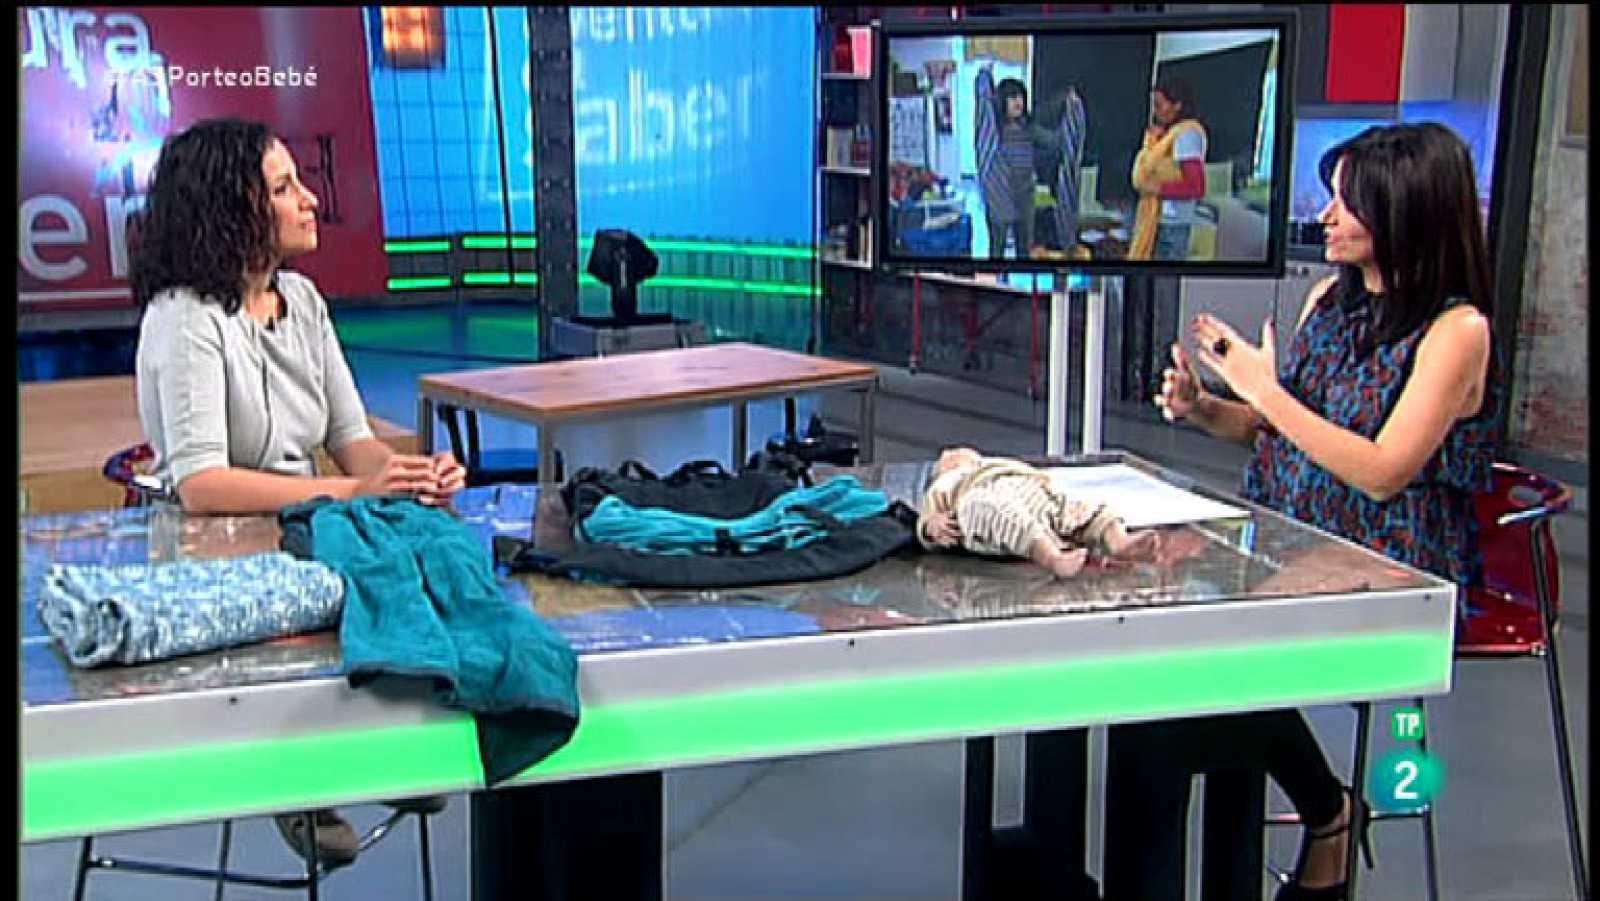 La Aventura del Saber. TVE. Taller de maternidad. Elena López Acuña, asesora de porteo infantil.